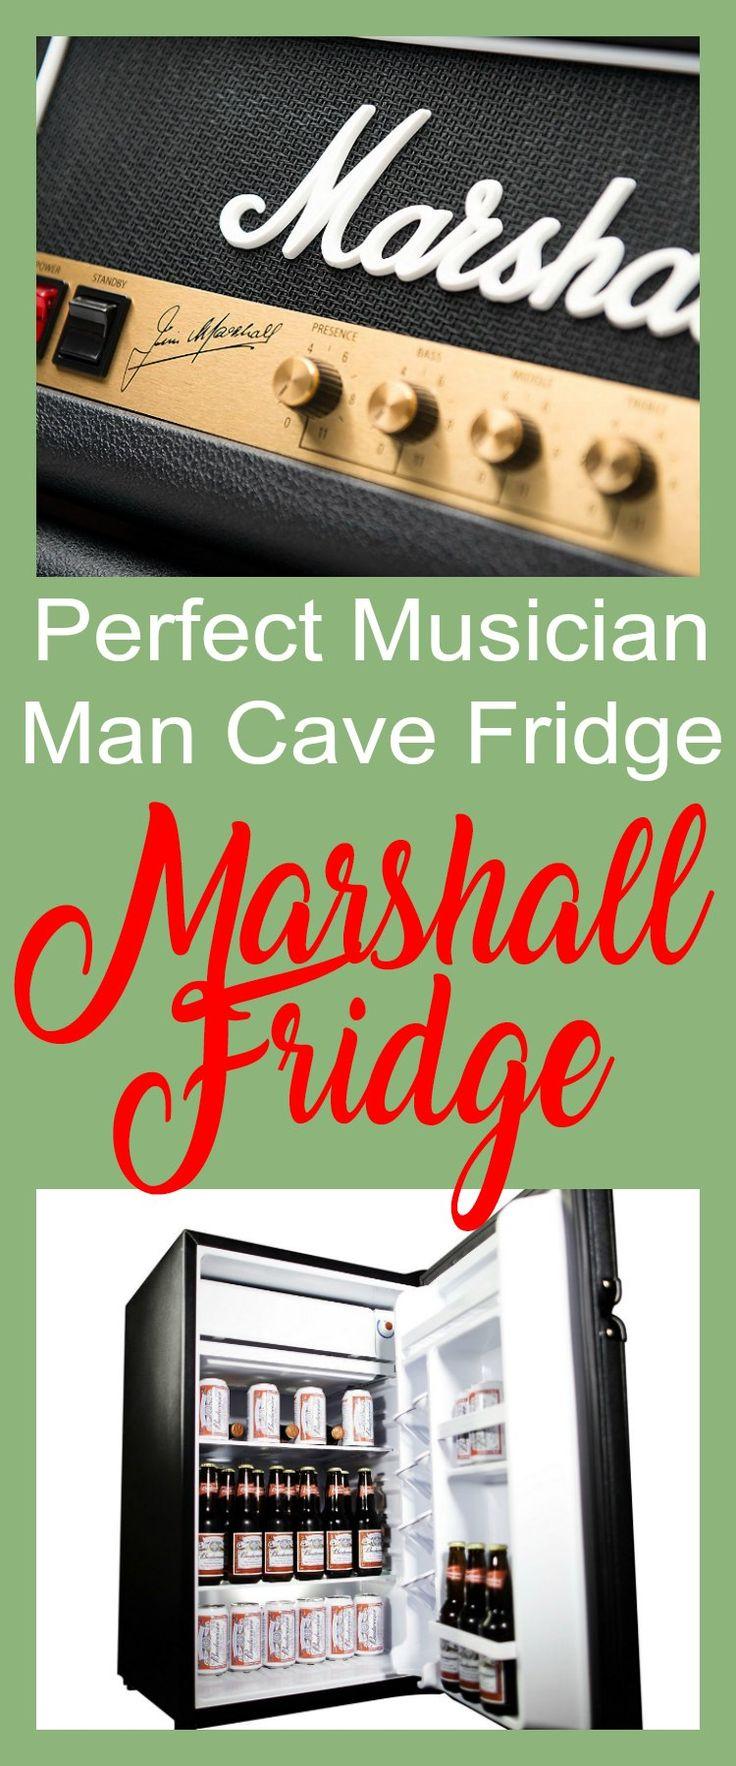 Perfect Musician Man Cave Fridges